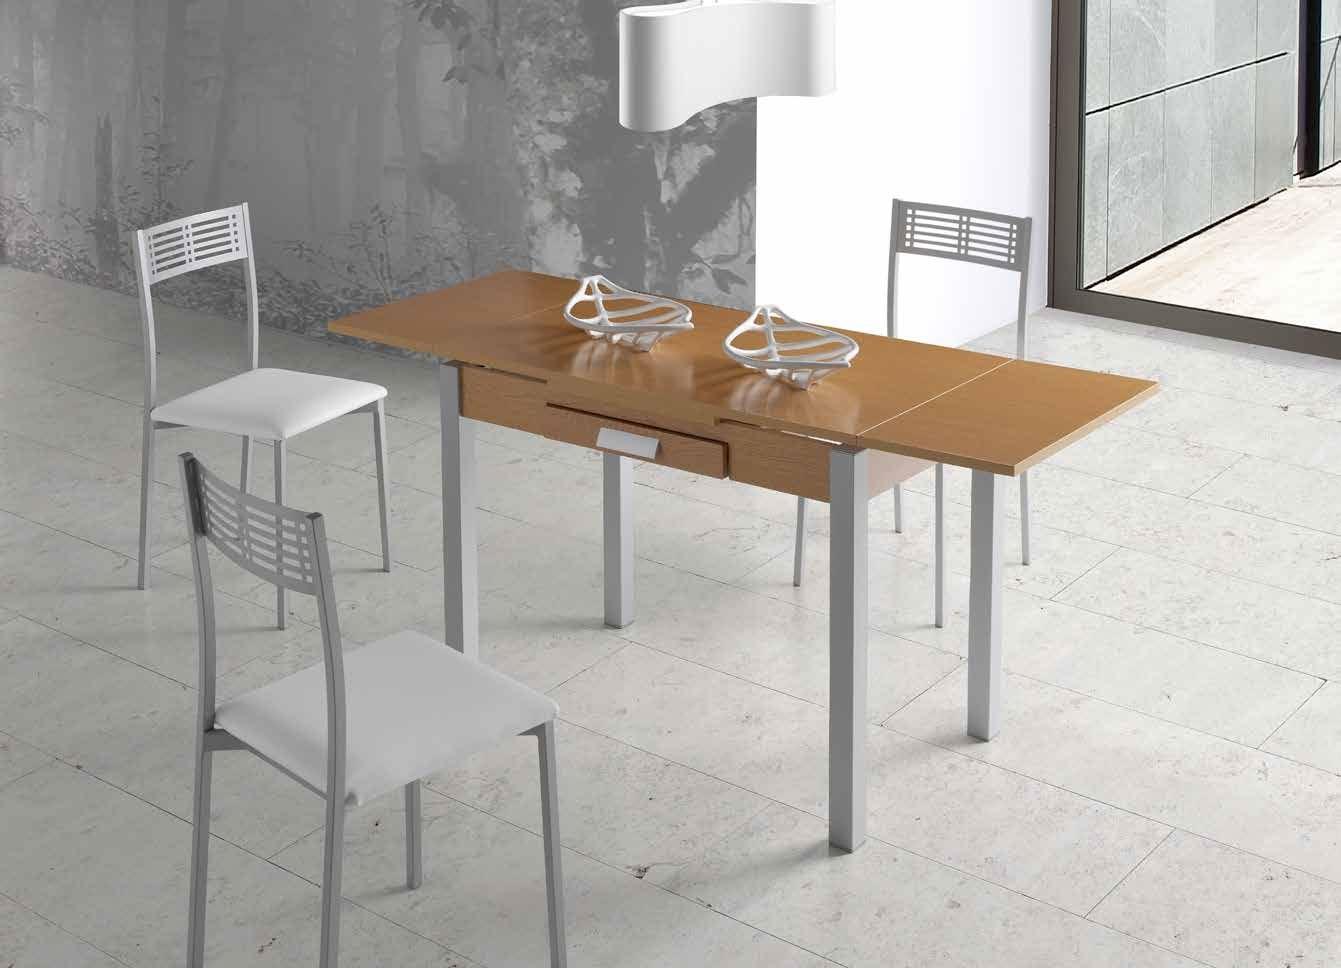 MESA DE COCINA EXTENSIBLE MAIA - Mesa de cocina con apertura tipo libro en madera MDF laminada en blanco.